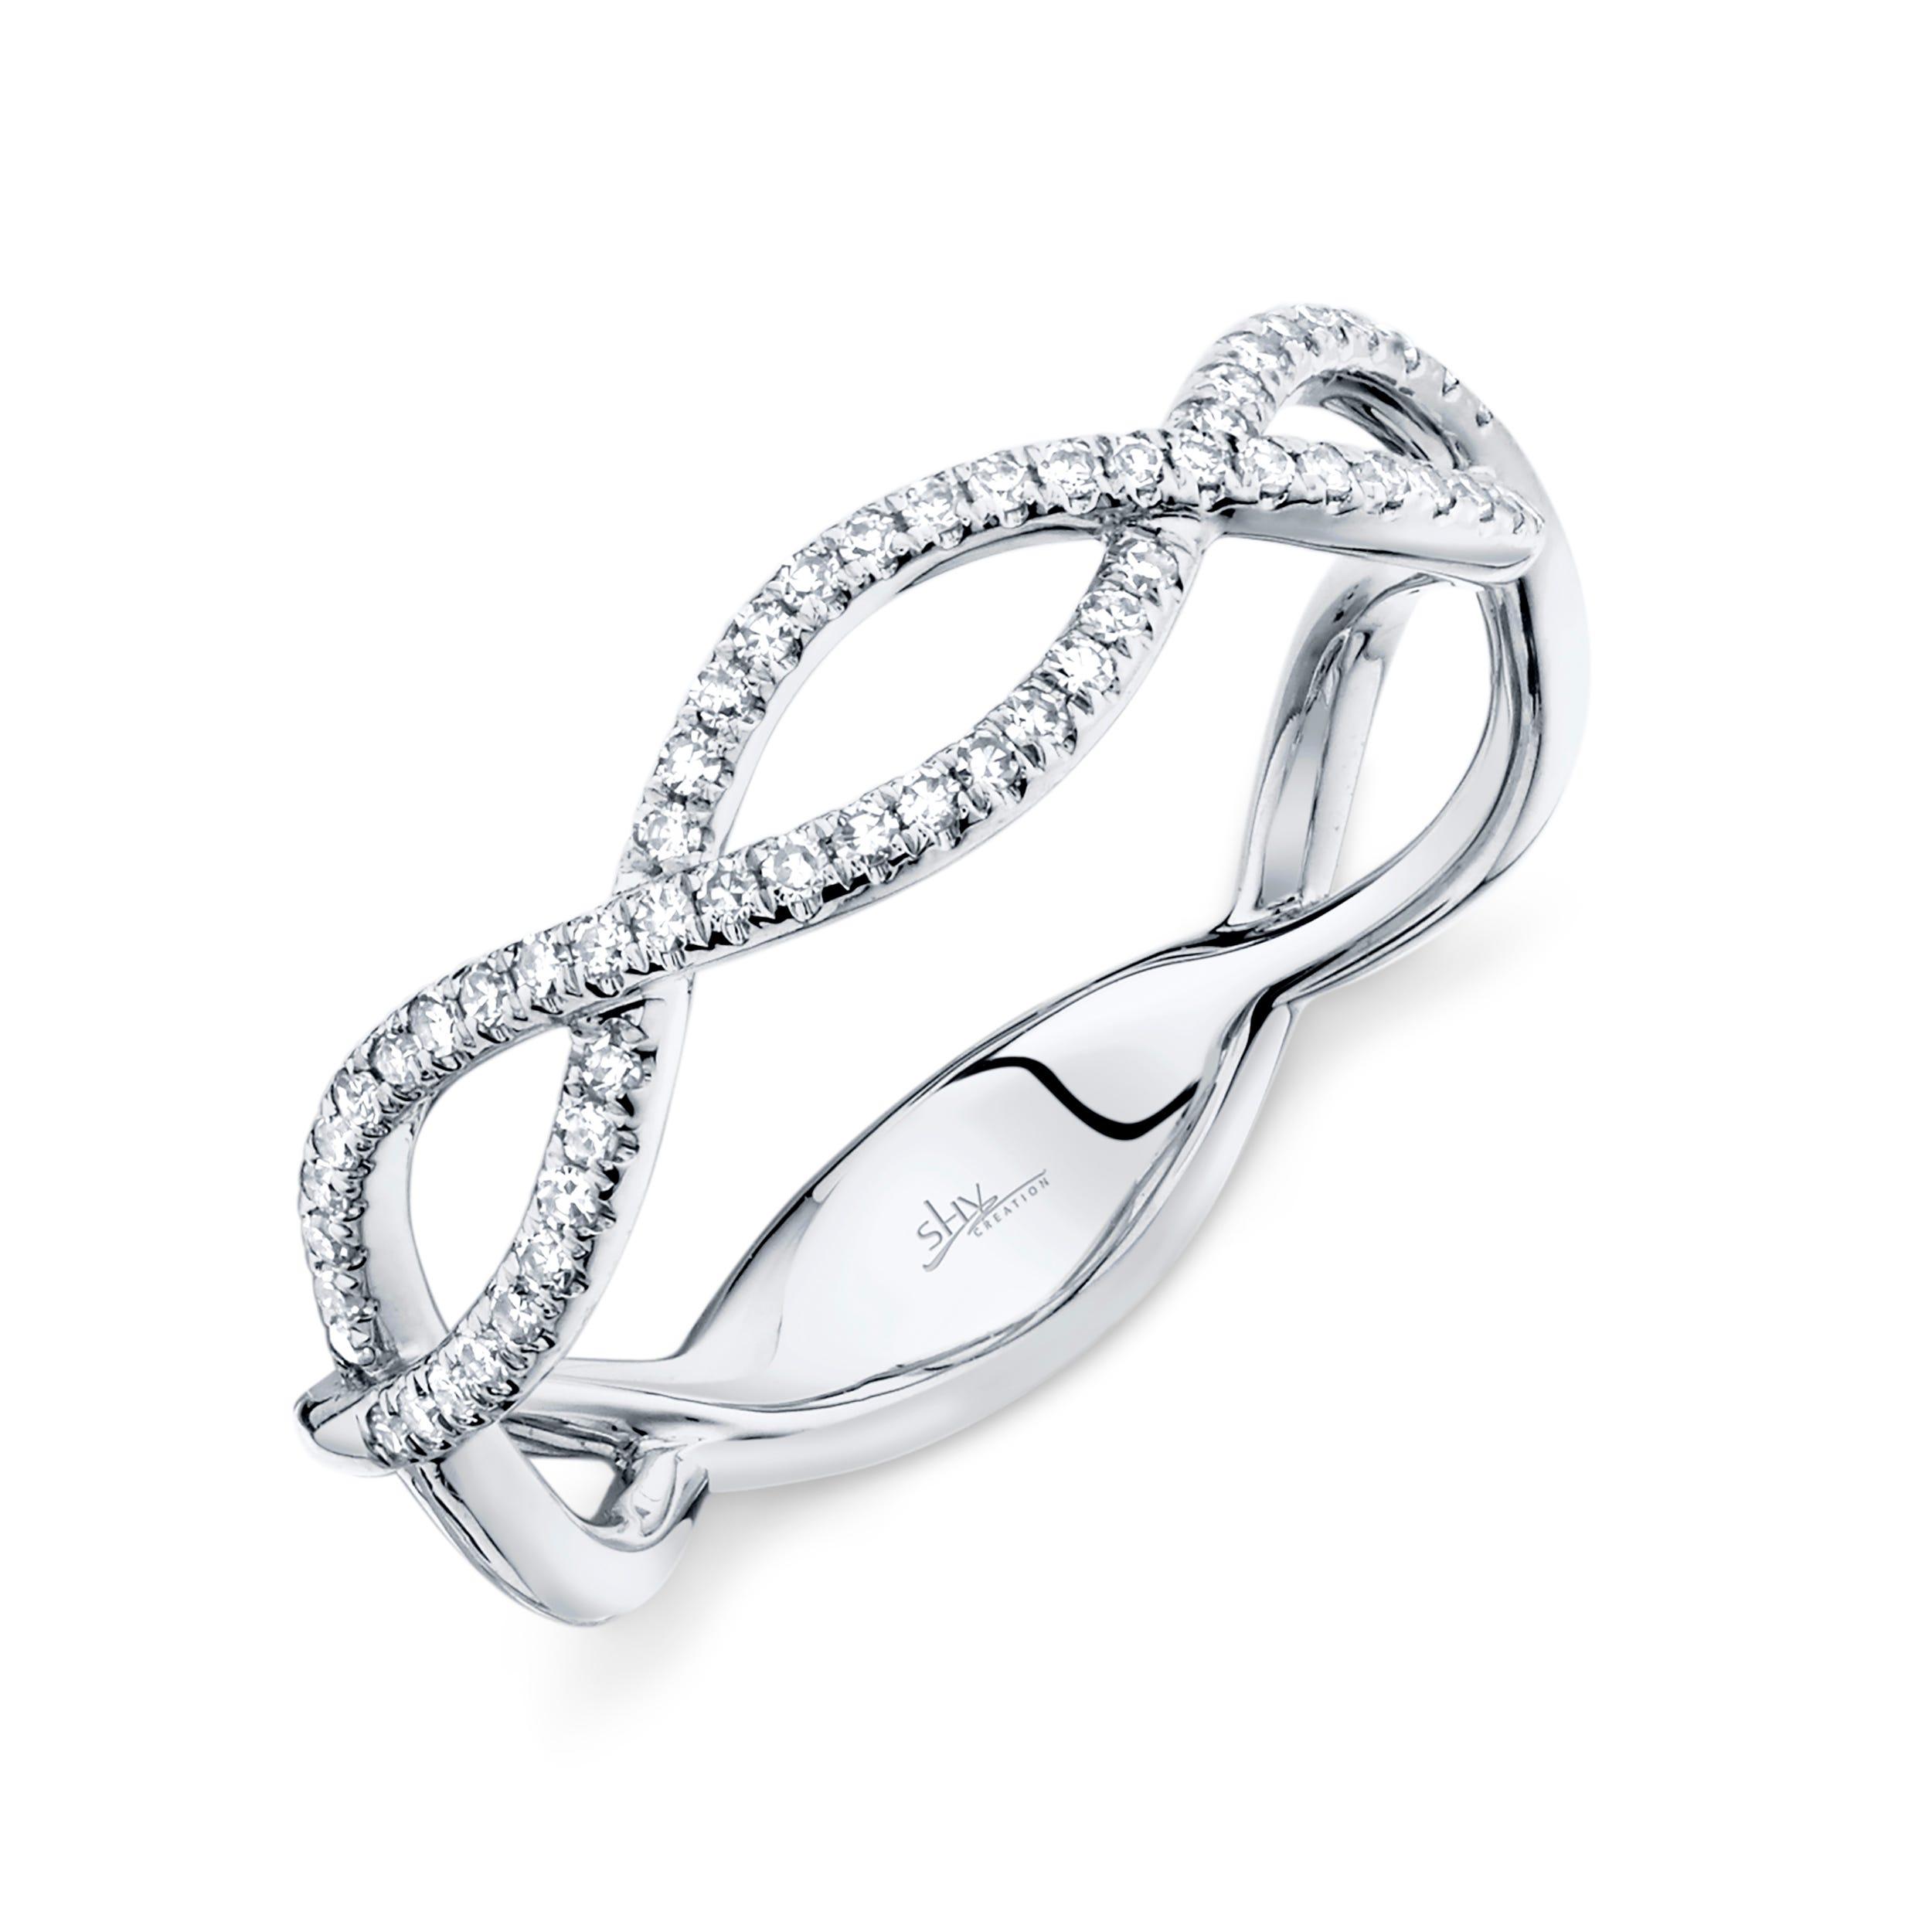 Shy Creation: Diamond Crisscross Open Fashion Ring in 14k White Gold